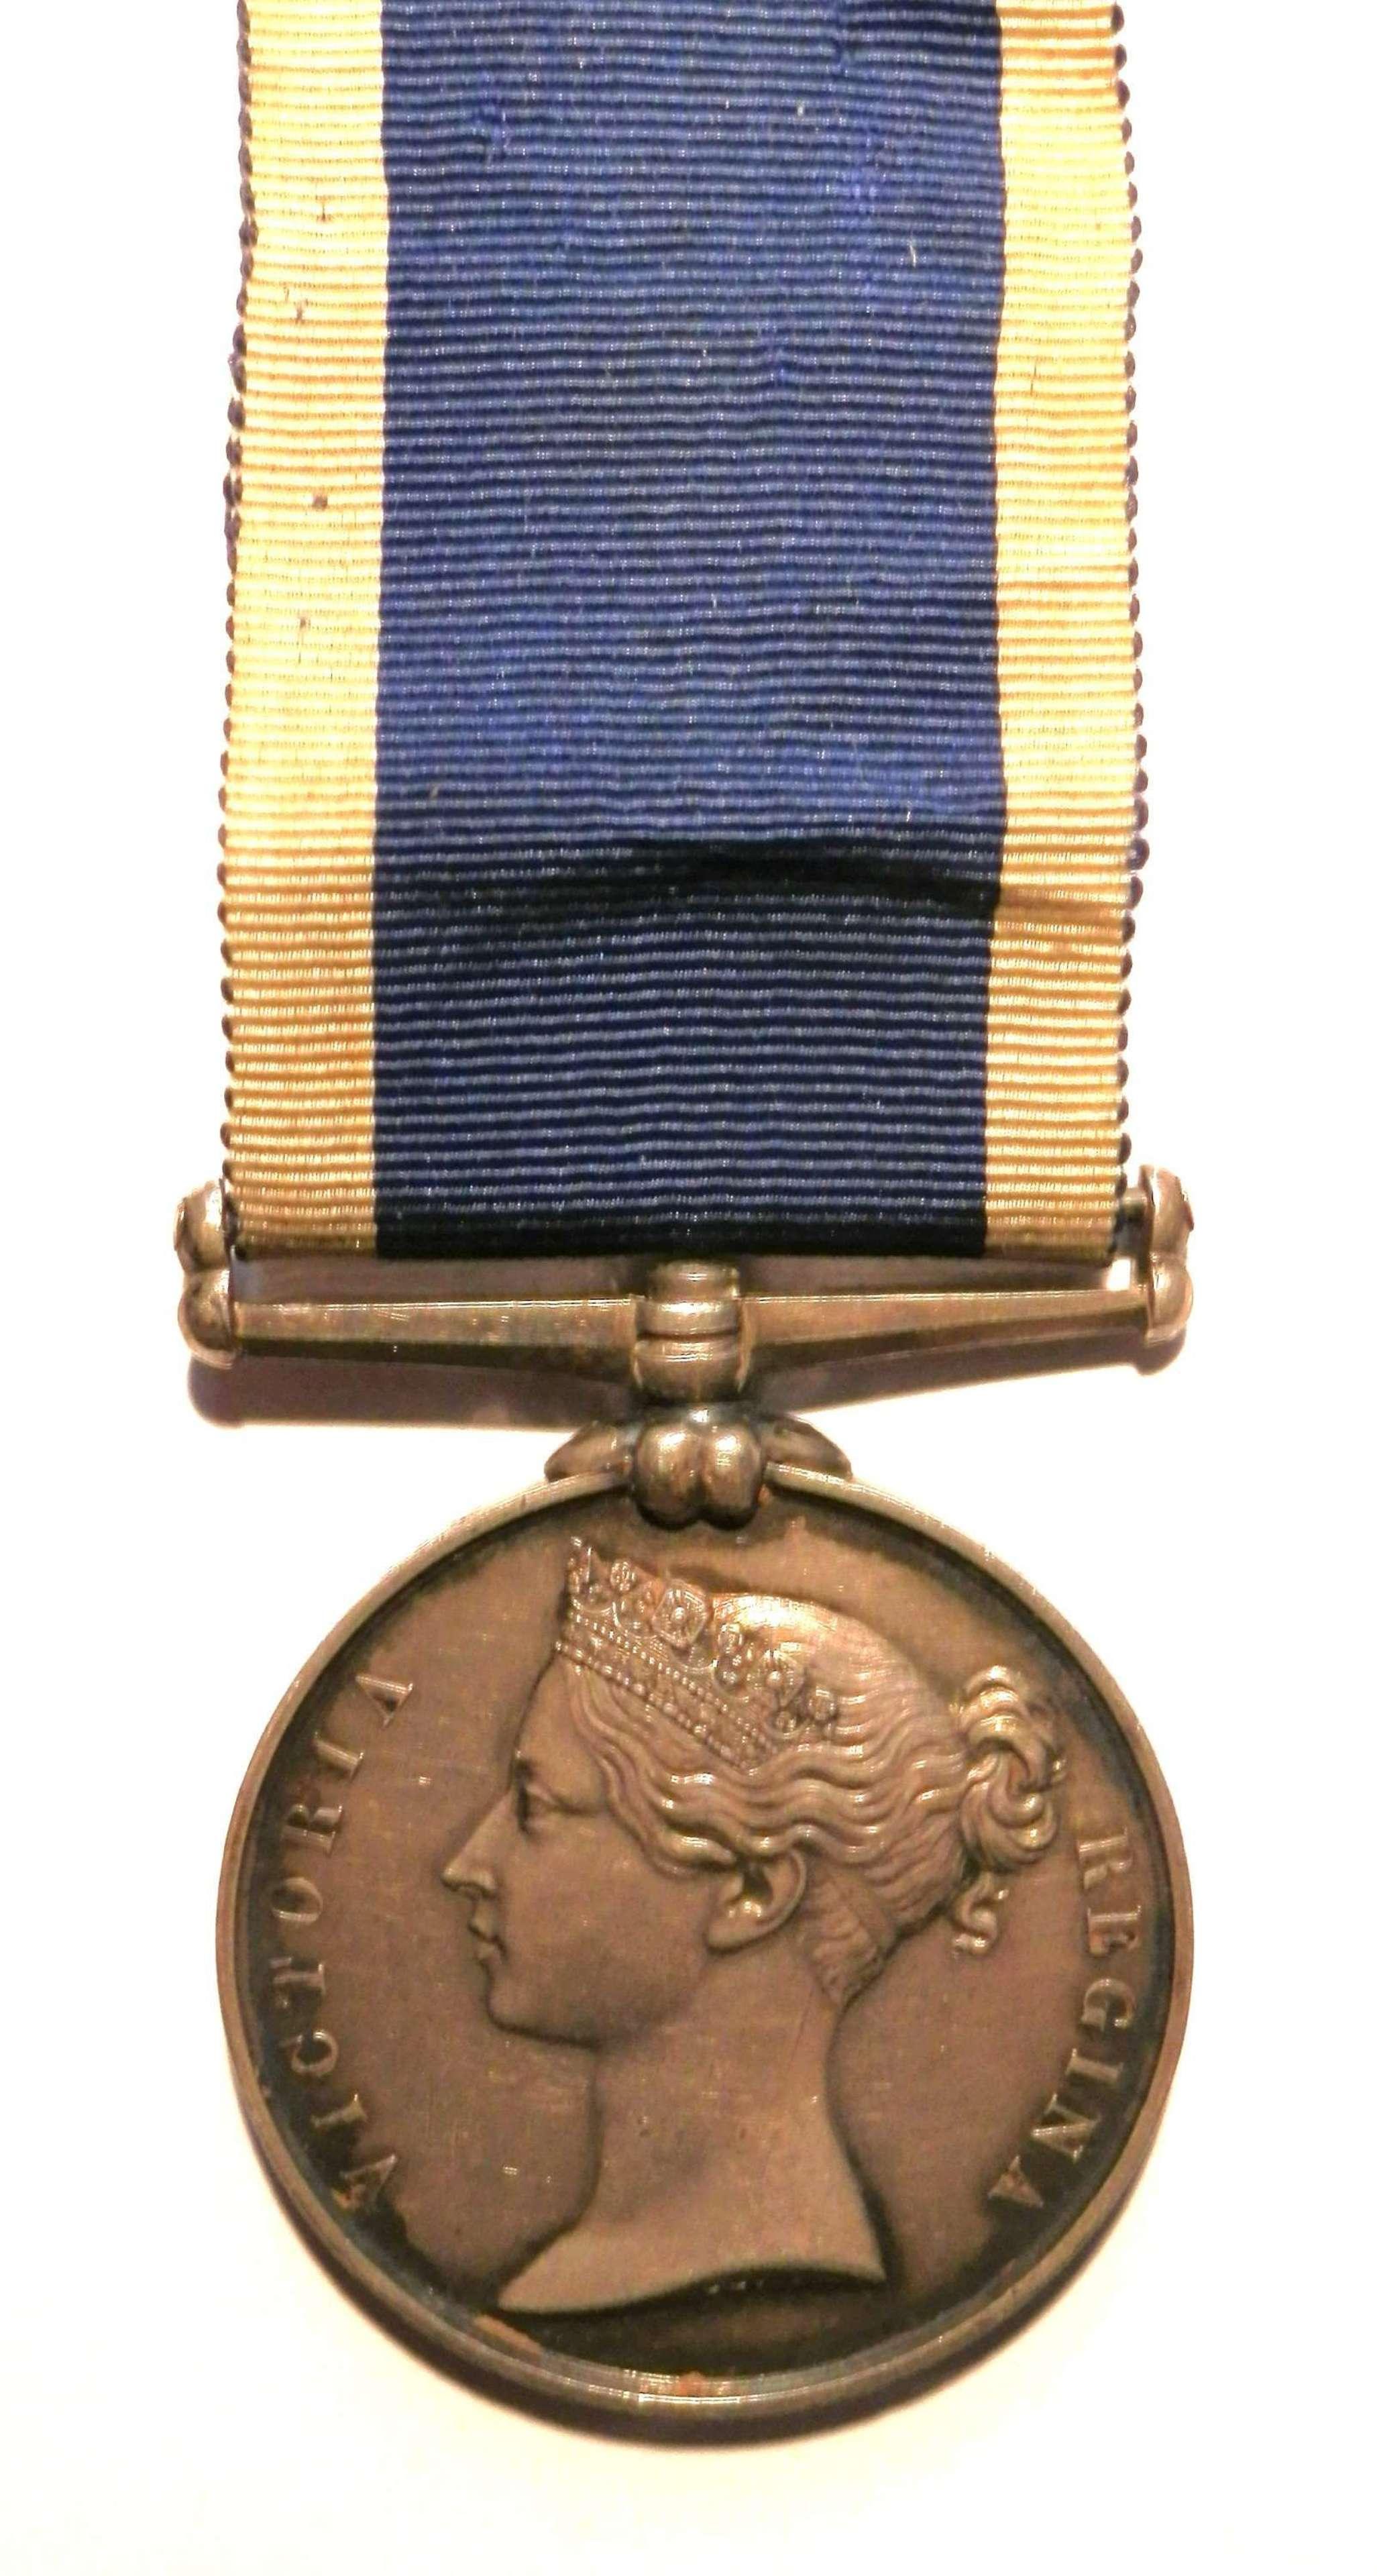 Royal Naval L.S. & G.C. T. Bartlett. Chief Boatman. H.M. C.G.